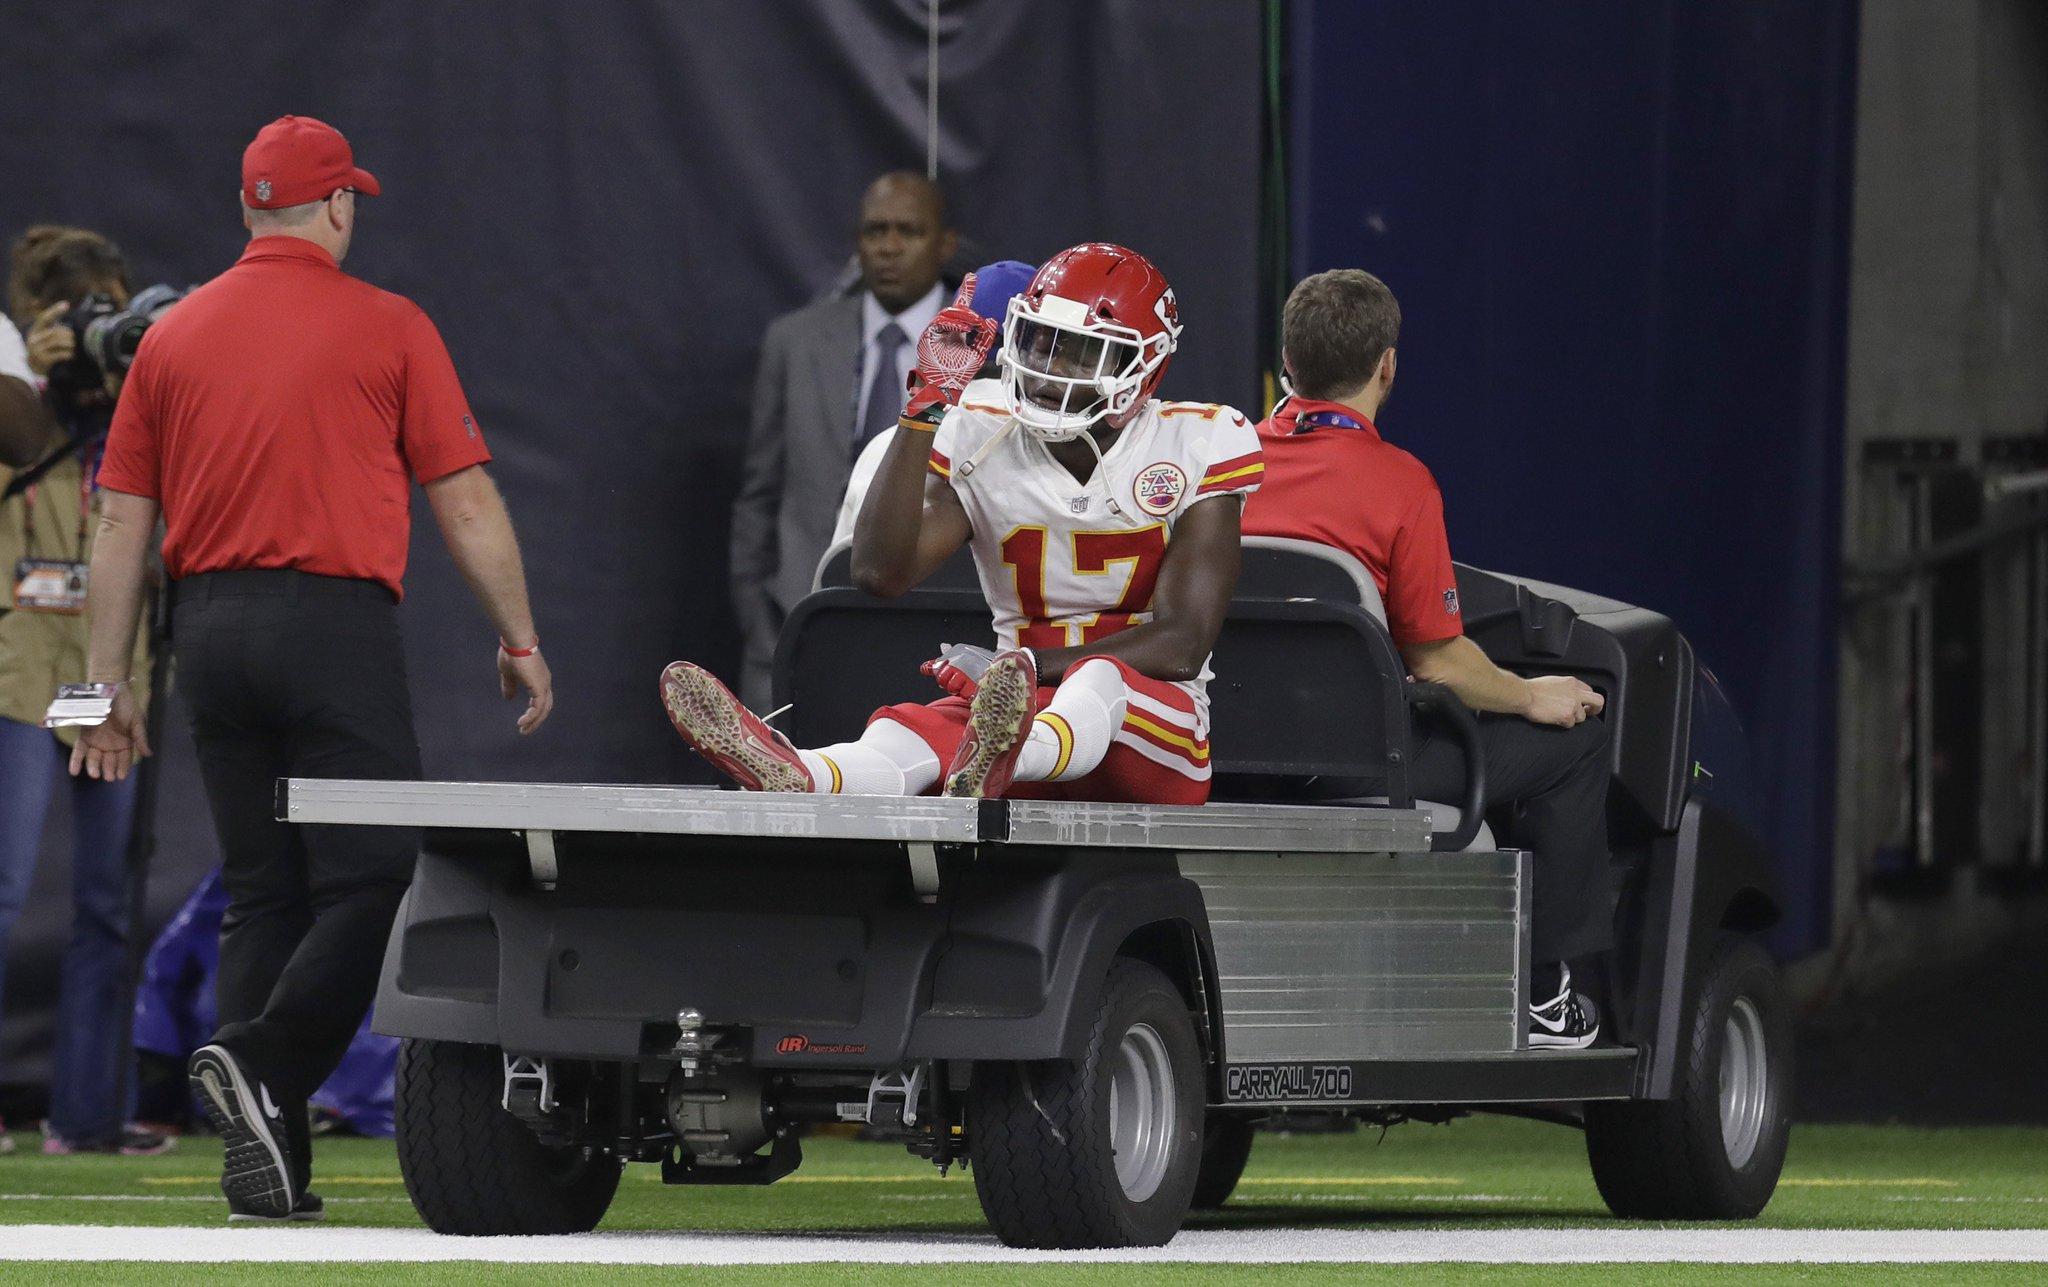 Chiefs WR Chris Conley suffers  ruptured Achilles tendon vs. Texans https://t.co/Wsc0hsPJDp https://t.co/cTgEqBIMpl